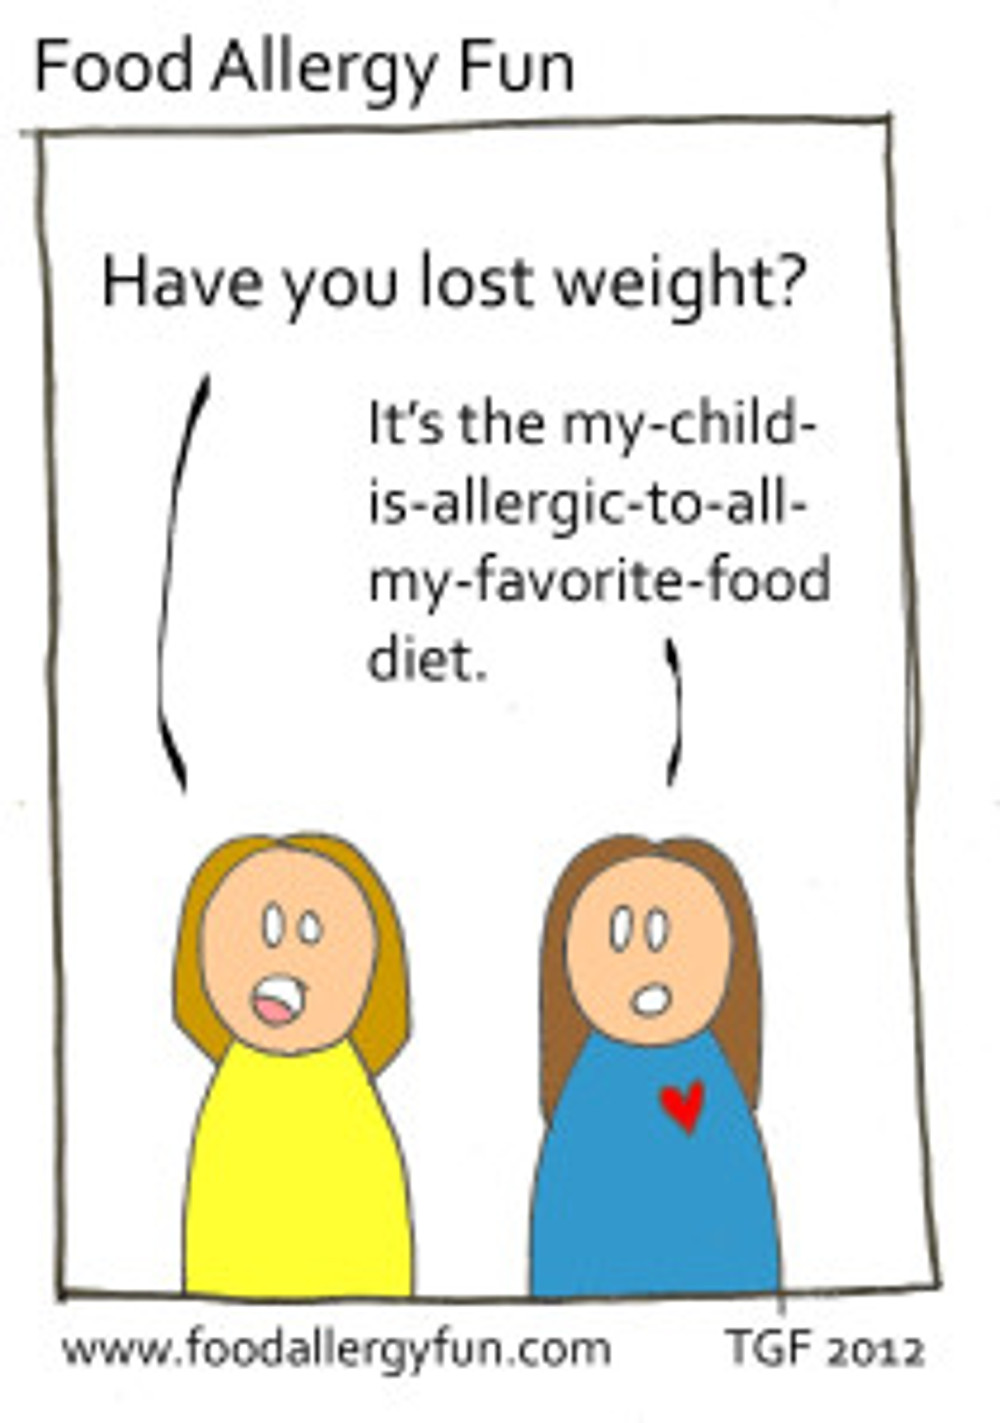 Food-Allergy-Fun-Allergic-Child-Cartoon